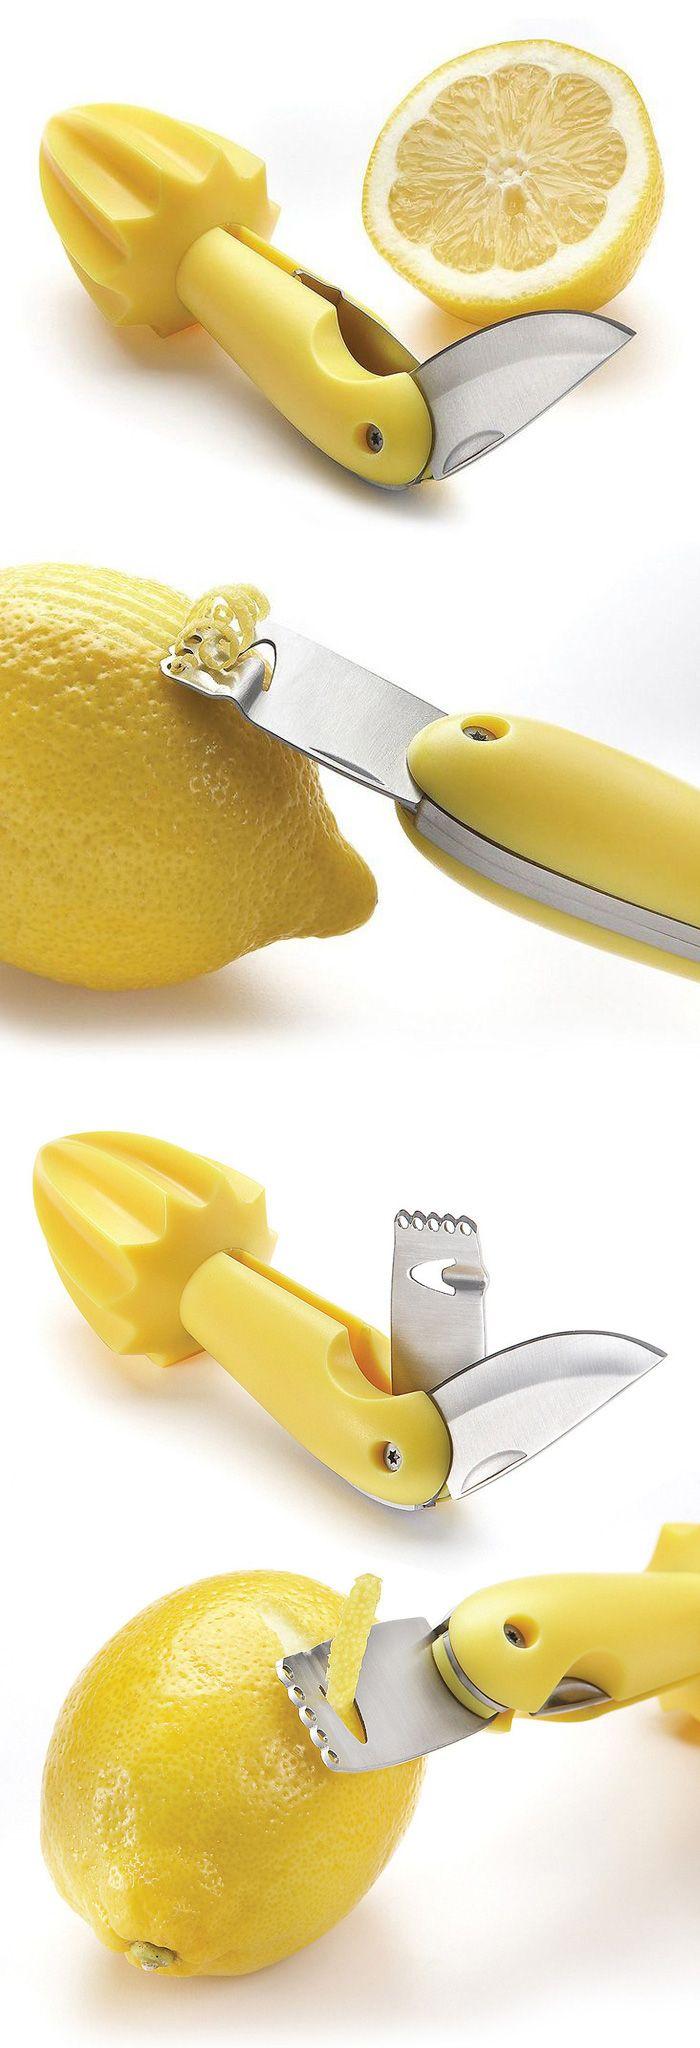 3-in-1 lemon knife and zester - so clever for baking, making lemon-infused drinks or cocktail garnishes! #product_design #kitchen #gadget